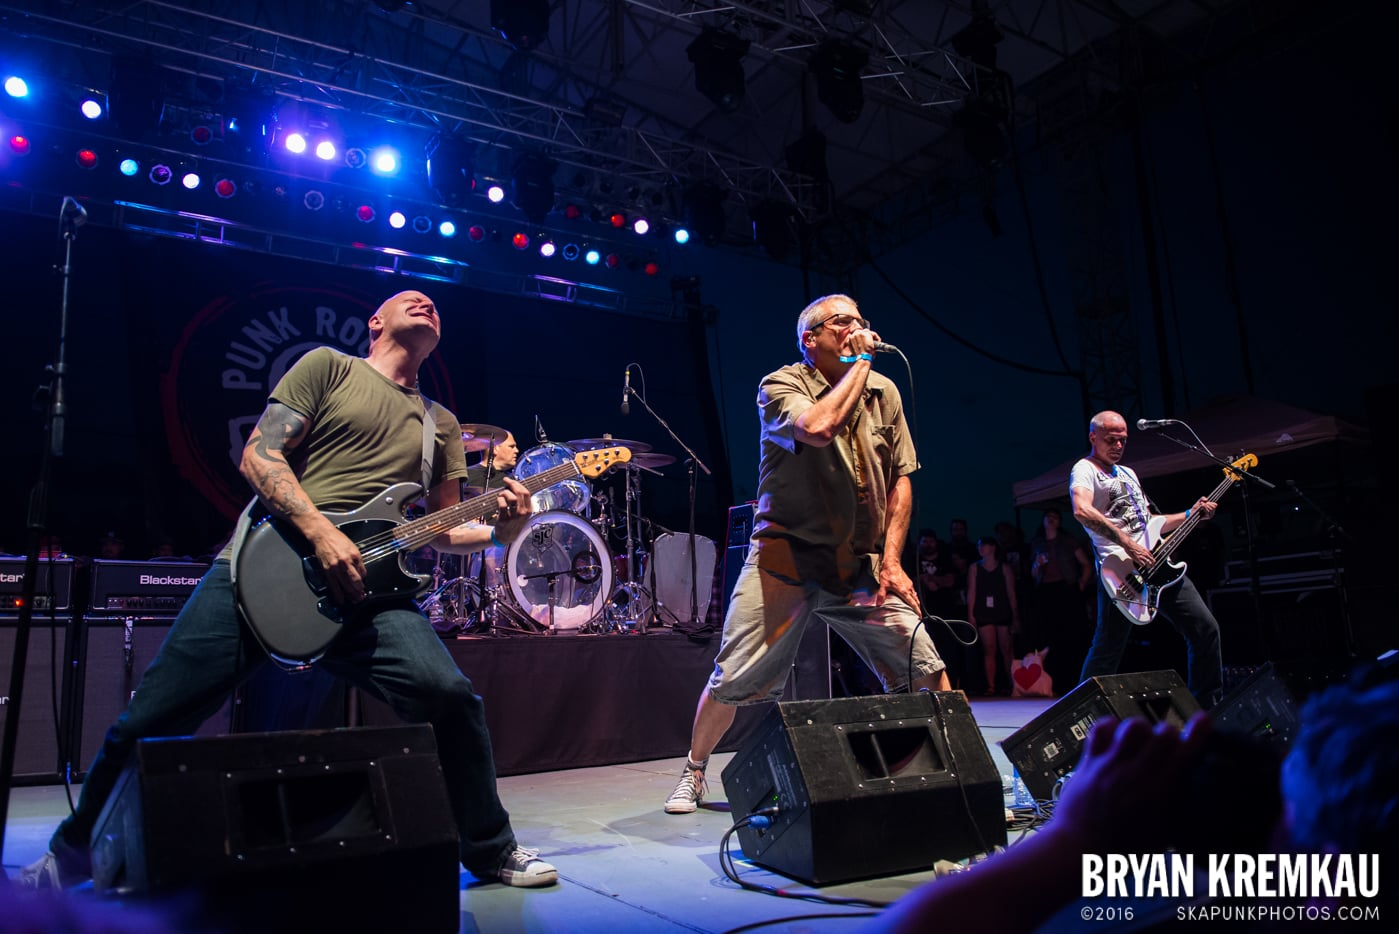 The Descendents @ Punk Rock Bowling, Stone Pony Summerstage, Asbury Park, NJ - 6.11.16 (12)